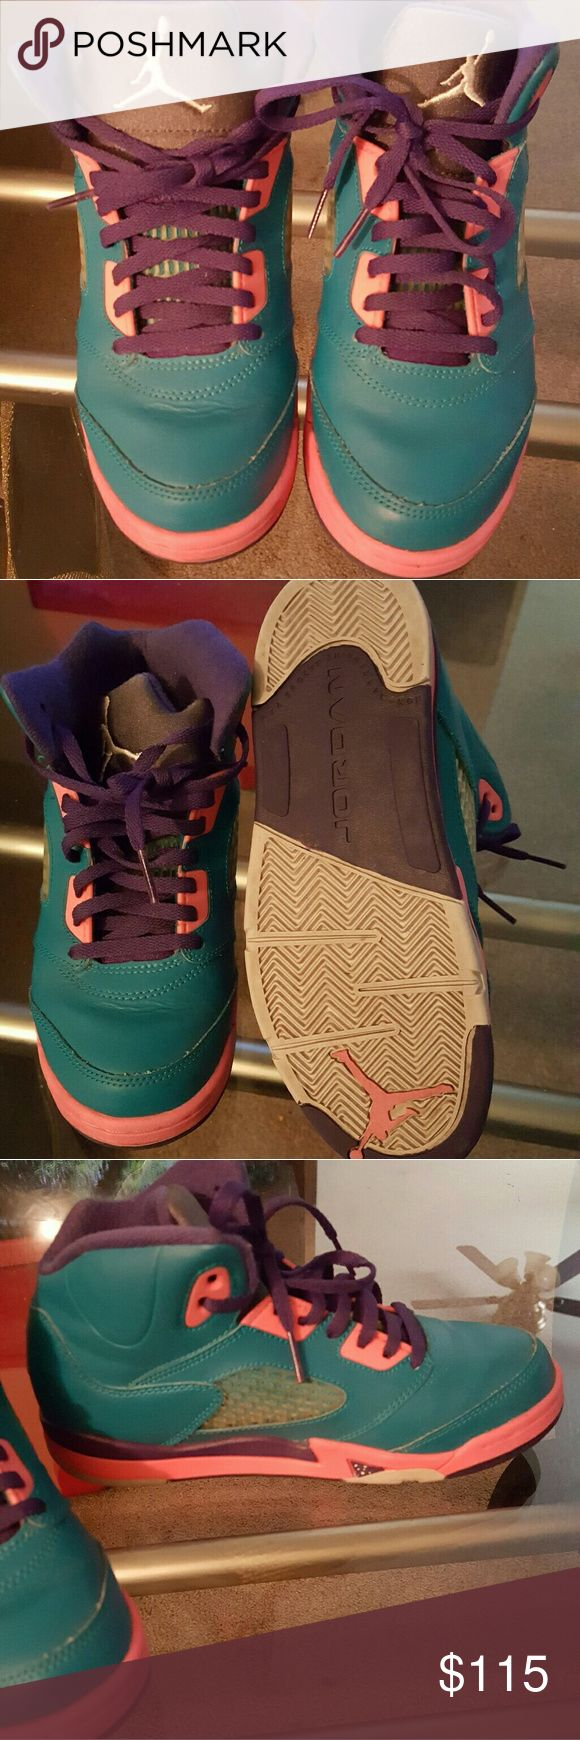 Kids jordan 5 retro teal pink and purple Like new worn once jordan 5 retro Jordan Shoes Sneakers